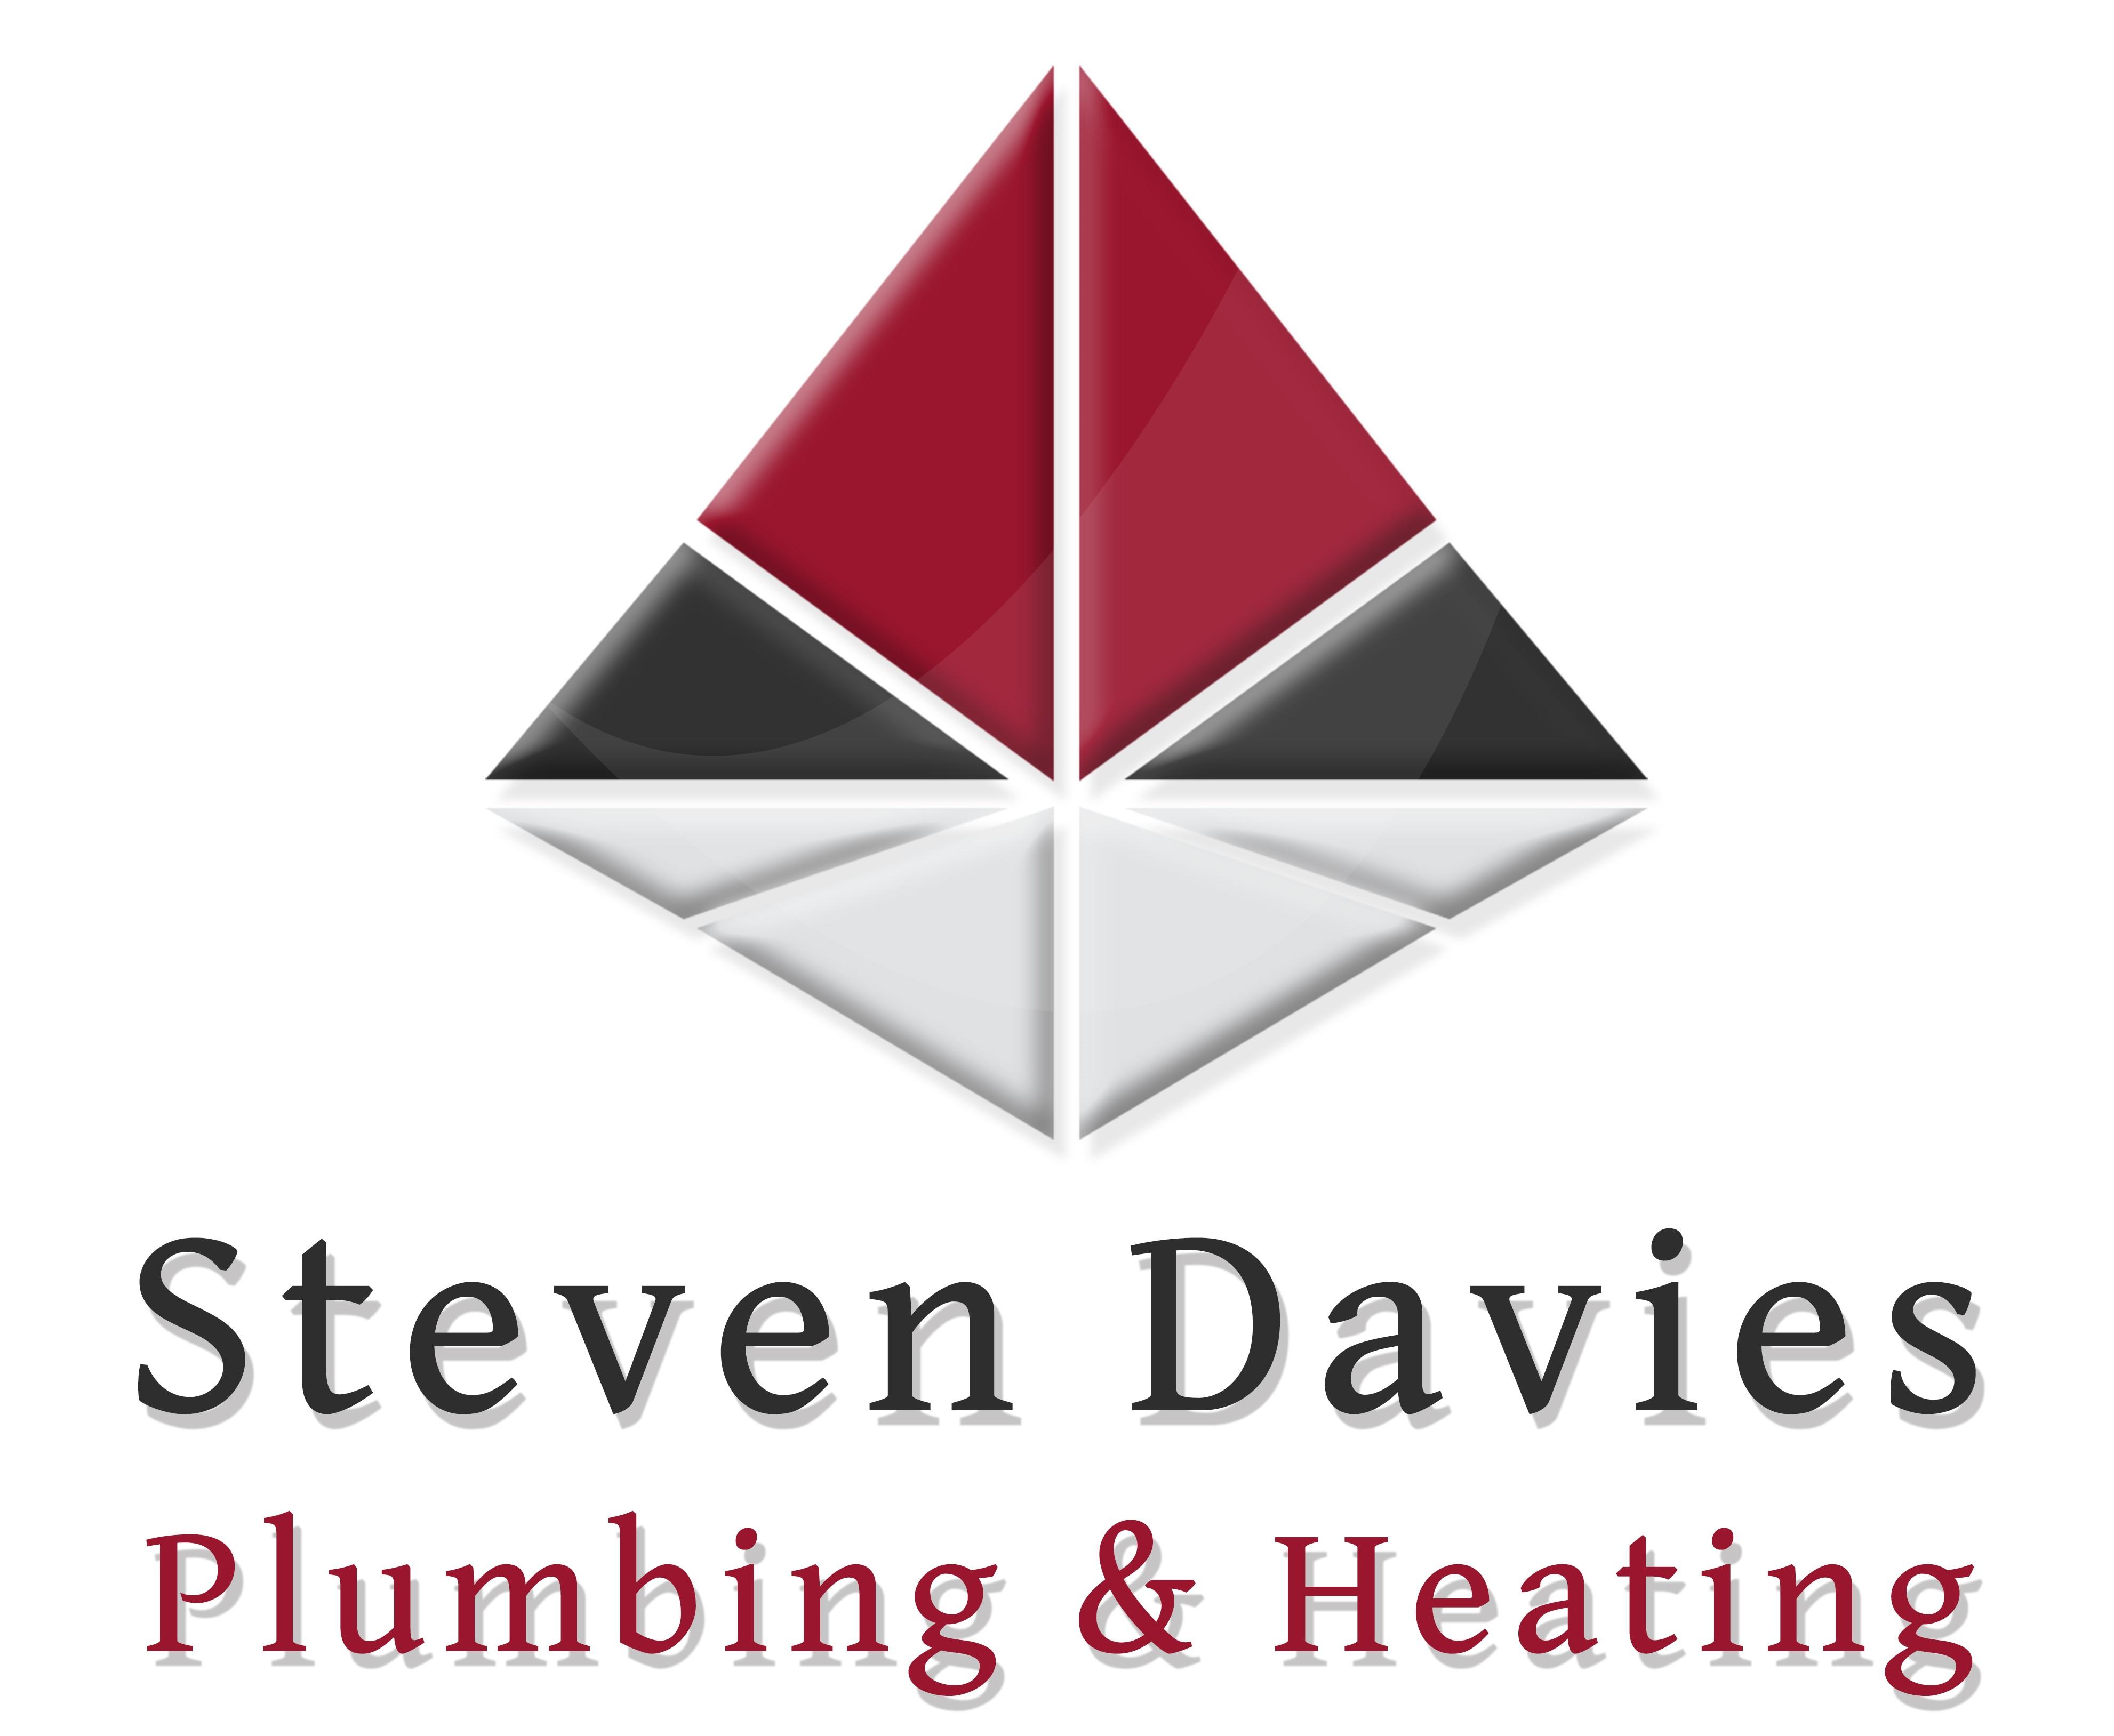 Steven Davies Plumbing & Heating Ltd Verified Logo